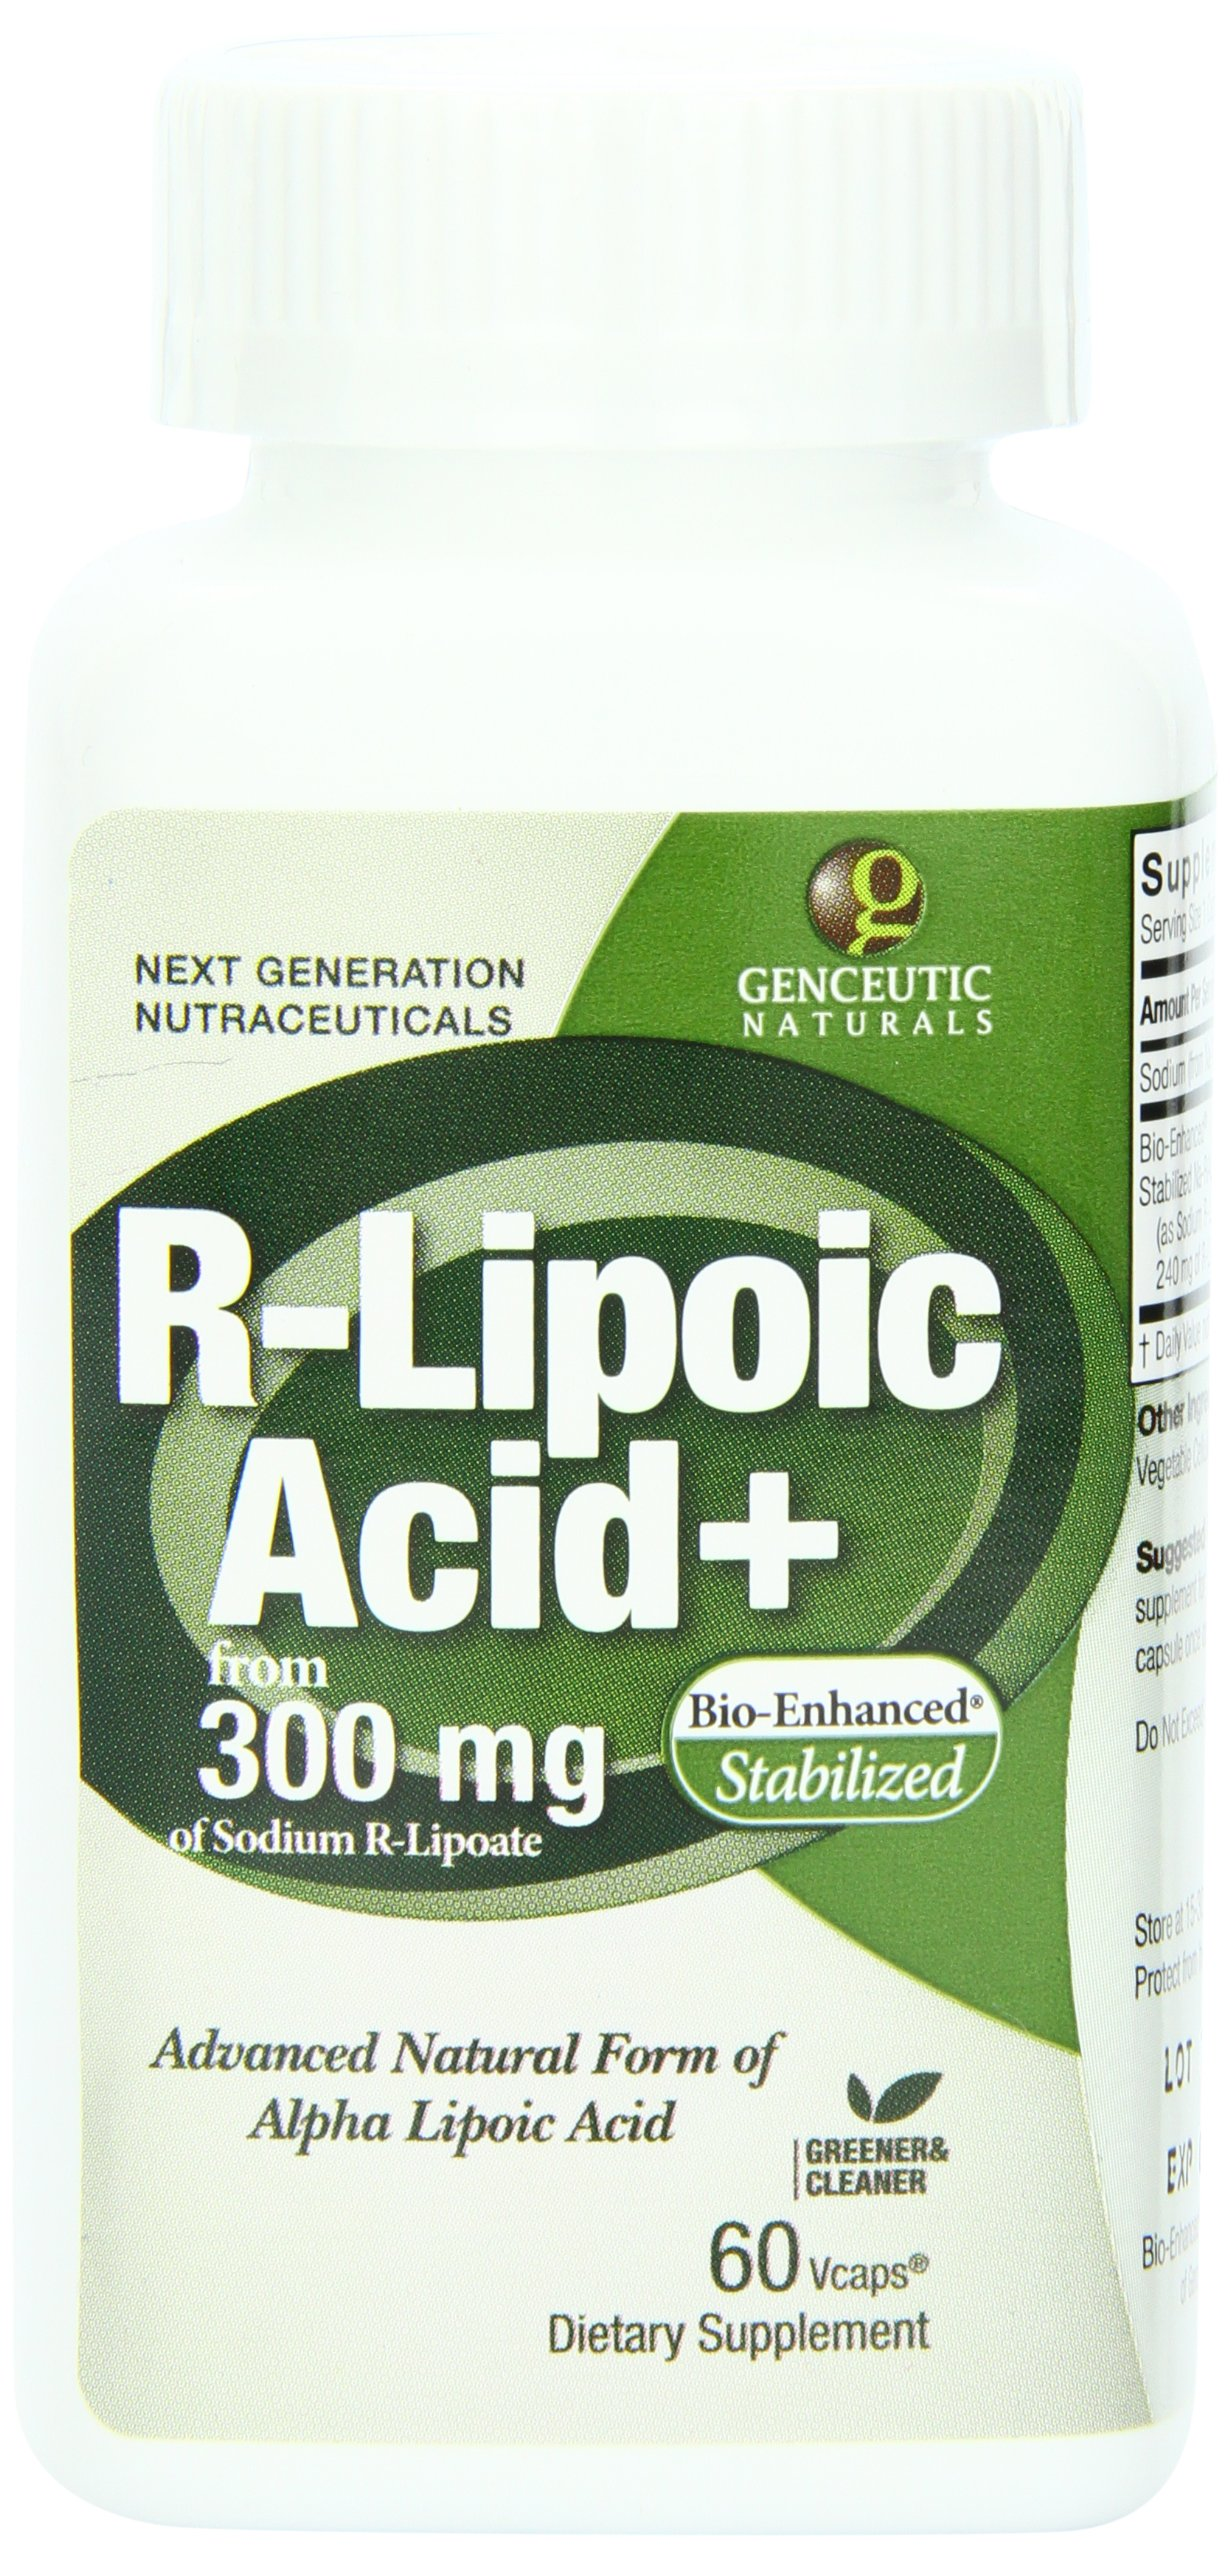 81K Paik8lL - Genceutic Naturals R-Lipoic Acid 300 Mg, 60-Count